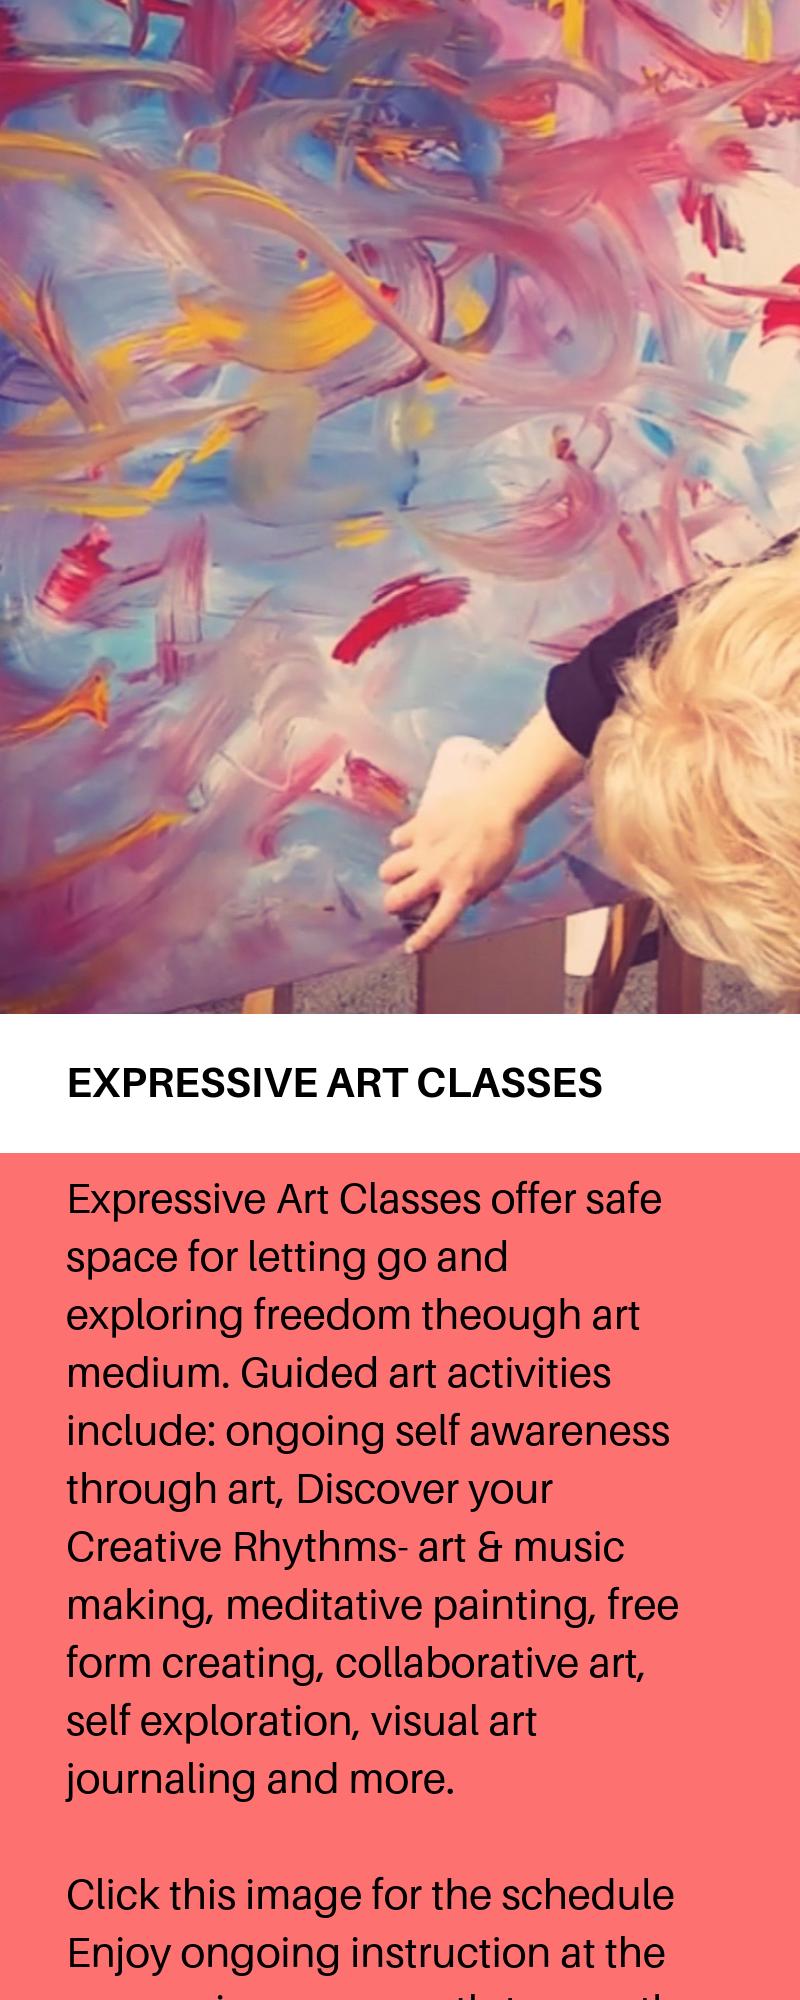 Part of our CREATIVE RHYTHMS - Expressive Arts & Rhythm programs